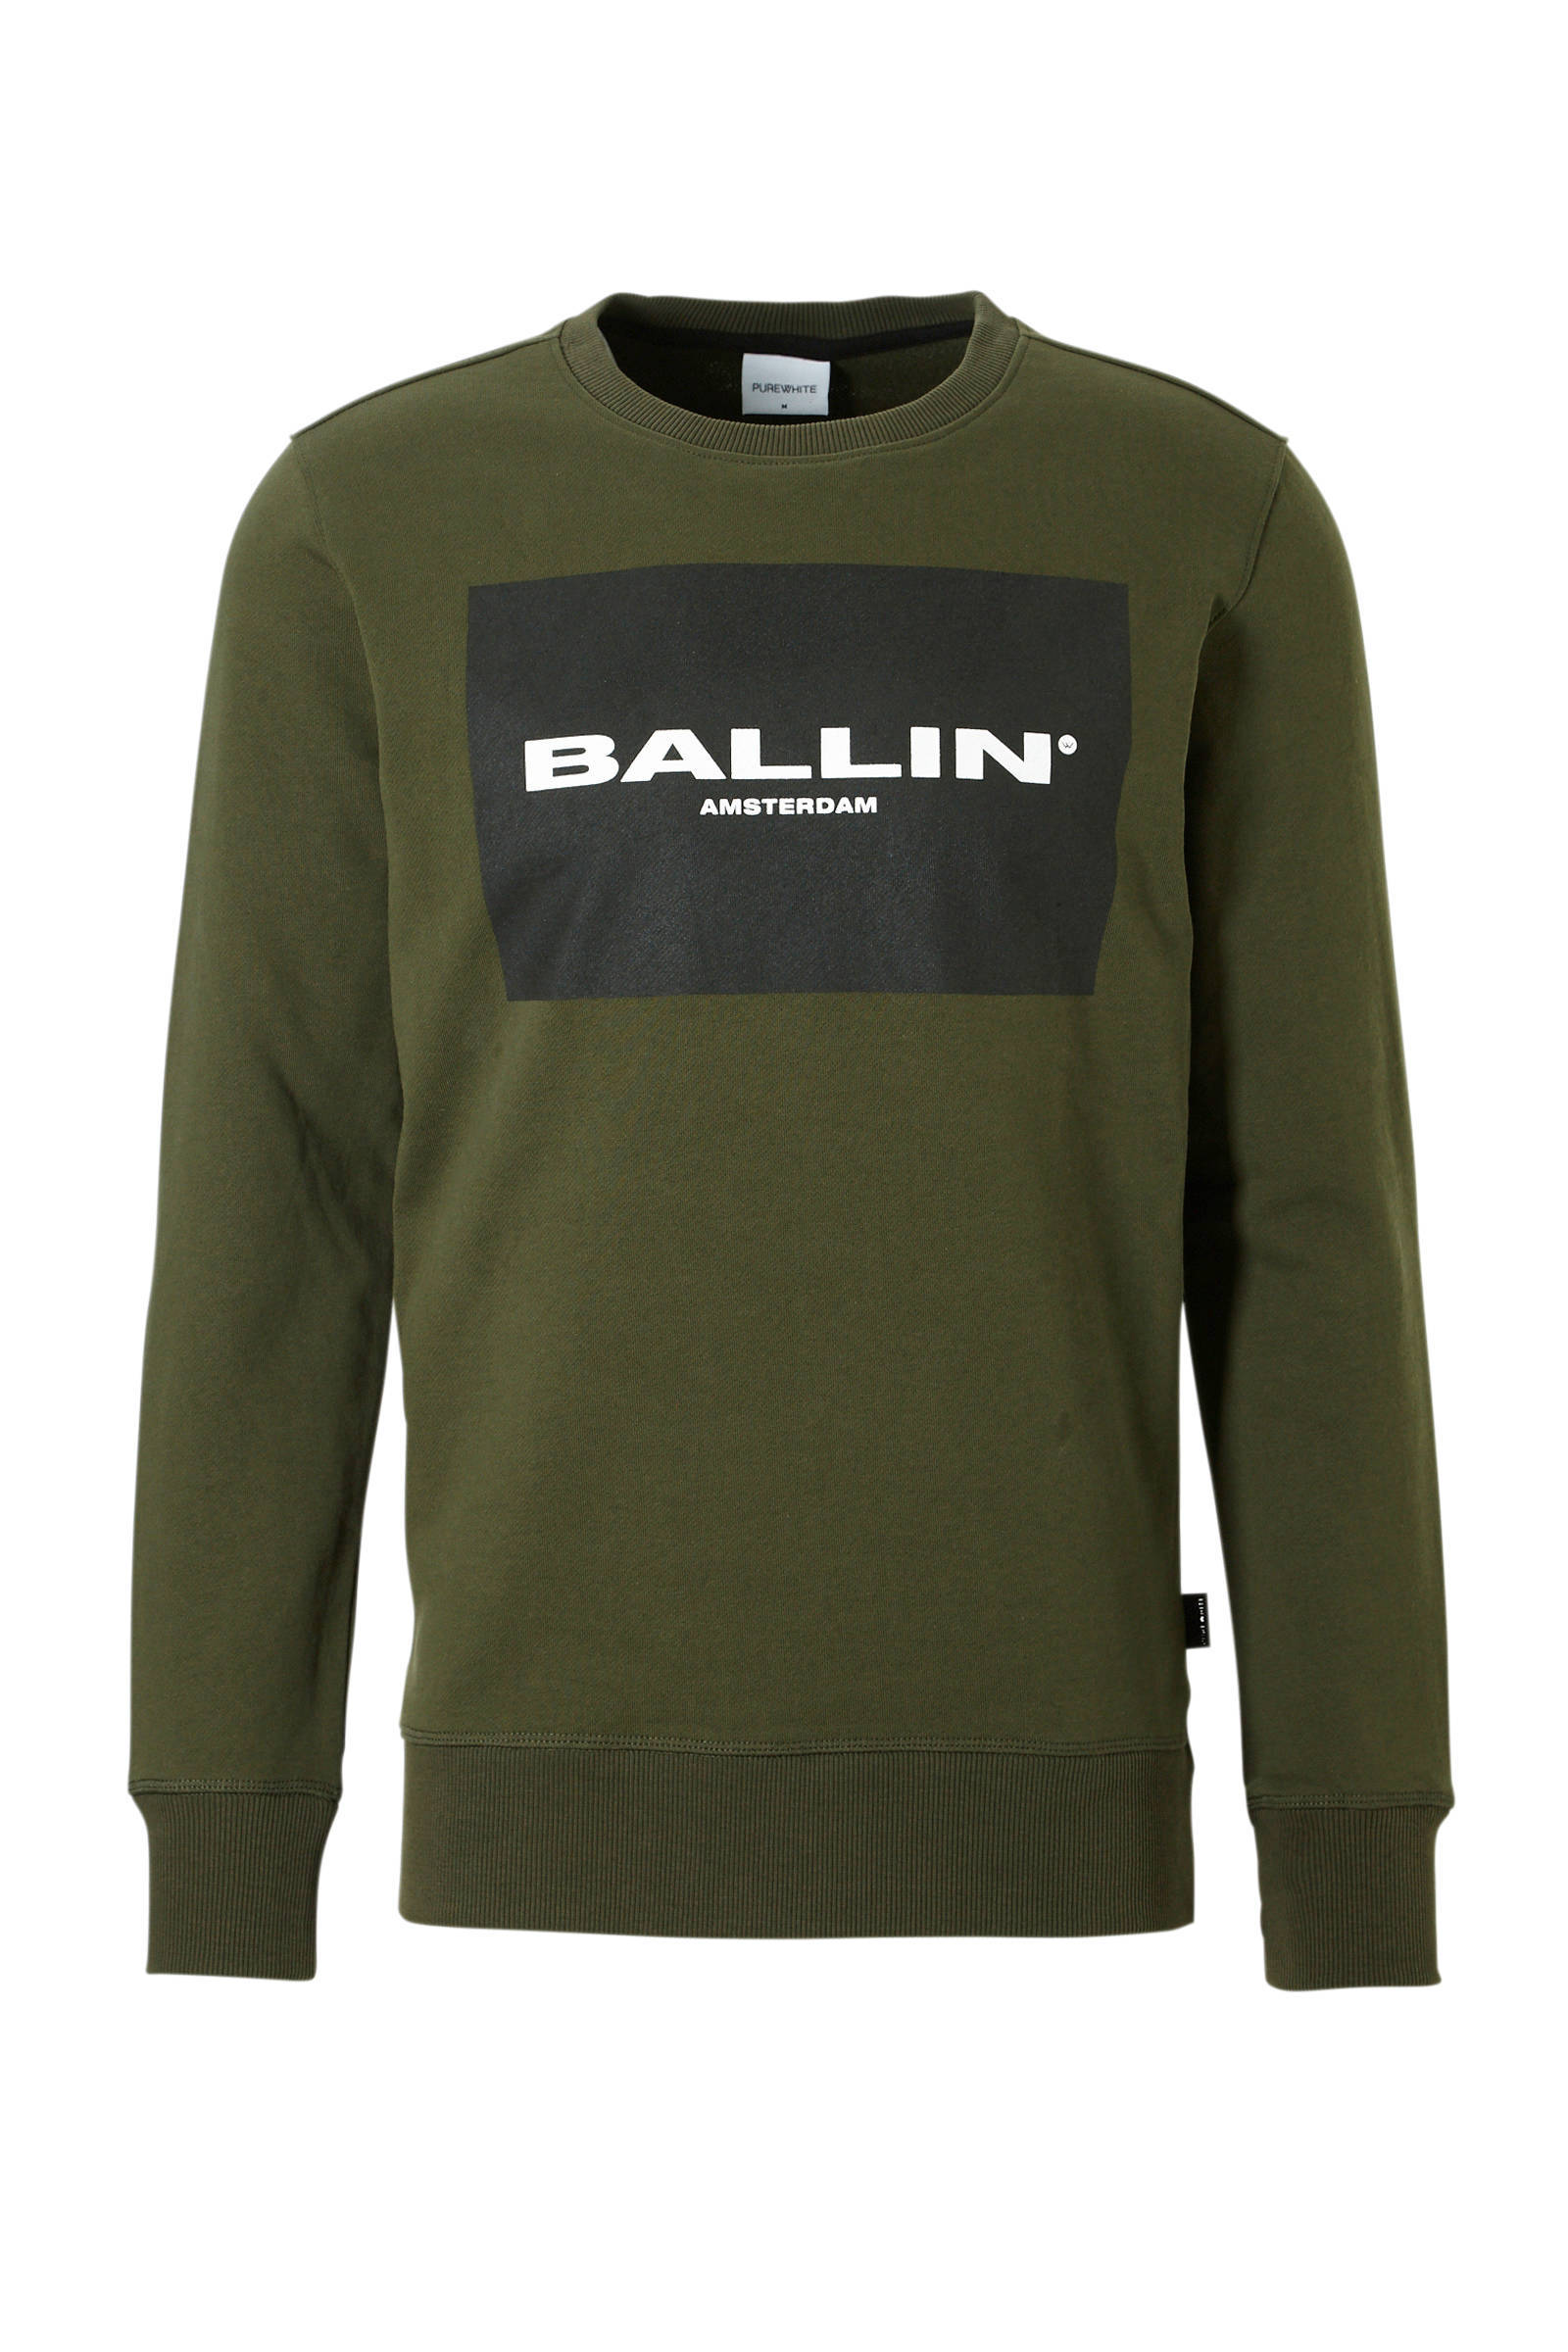 Purewhite Ballin sweater grey